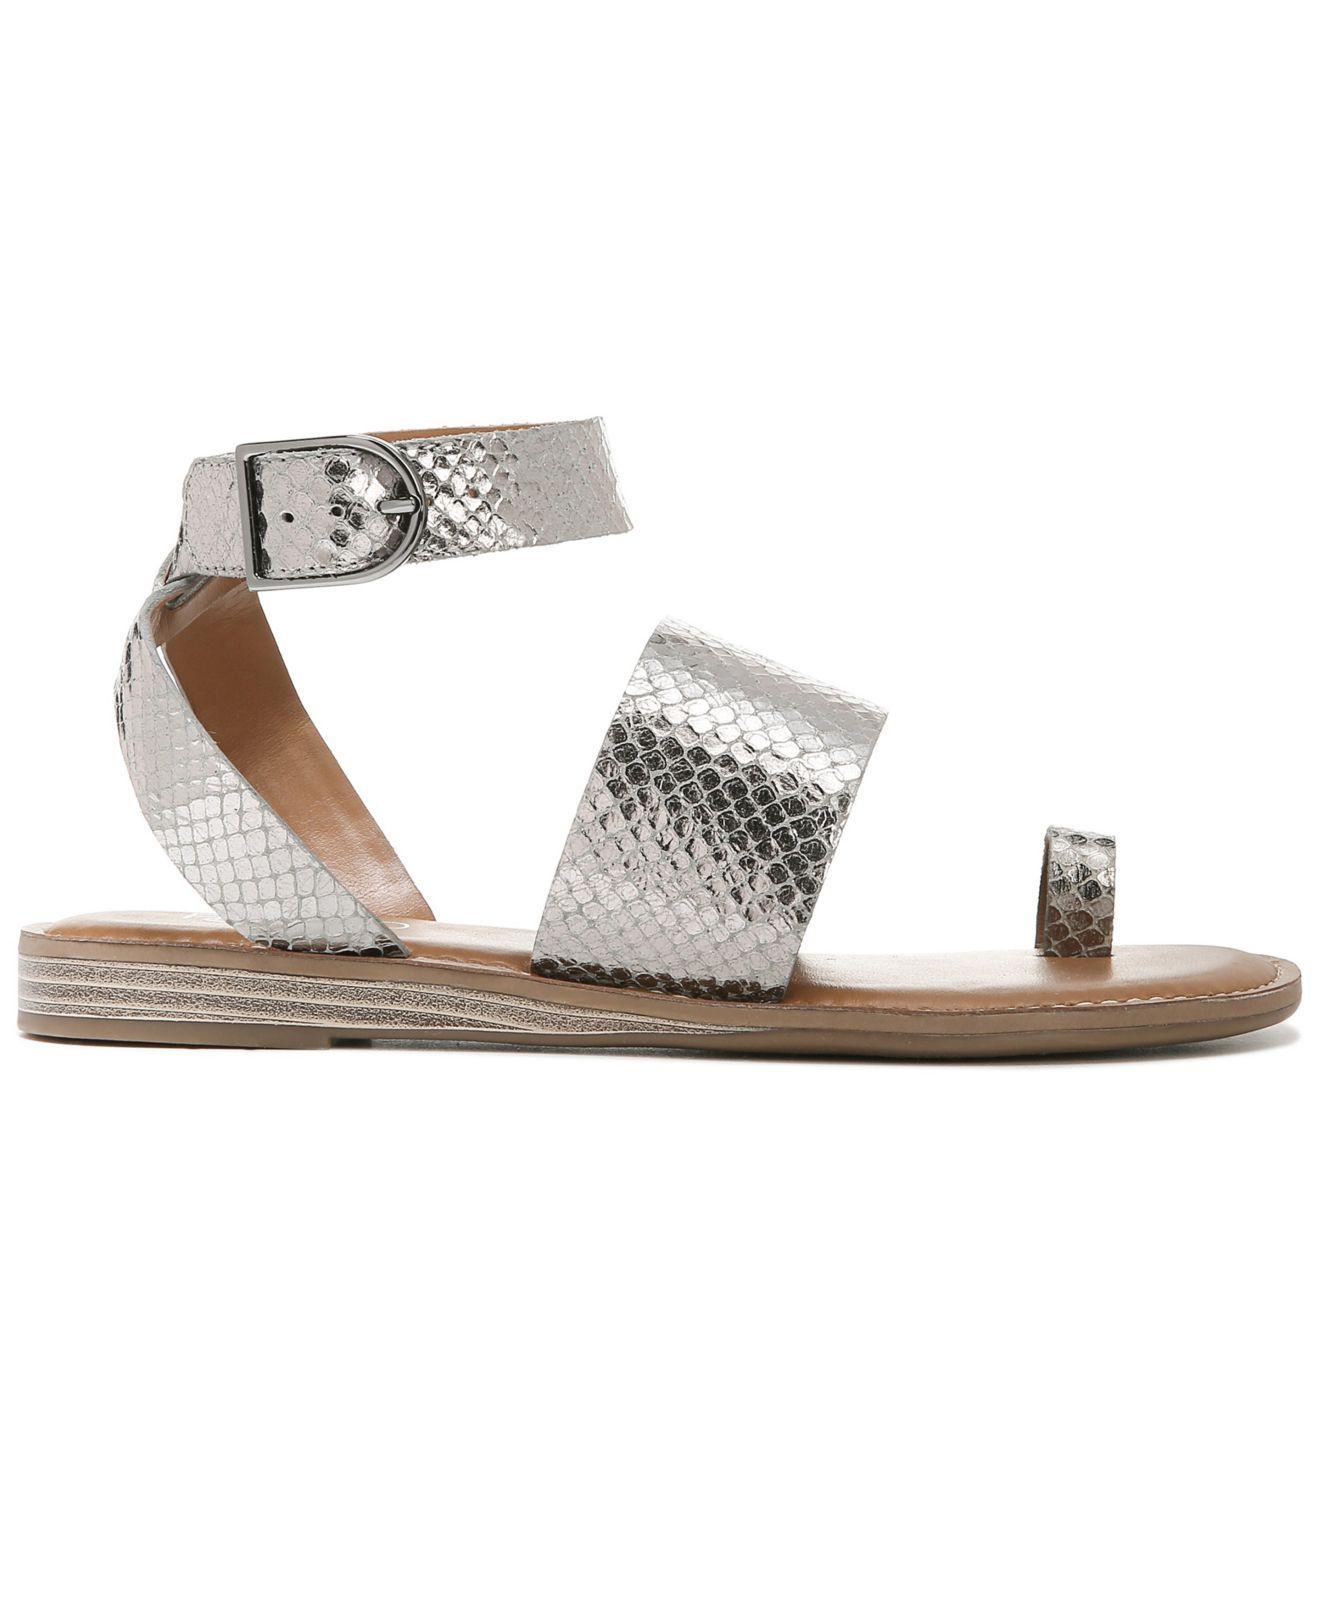 97d921cde843 Lyst - Franco Sarto Gracious Flat Sandals - Save 1%